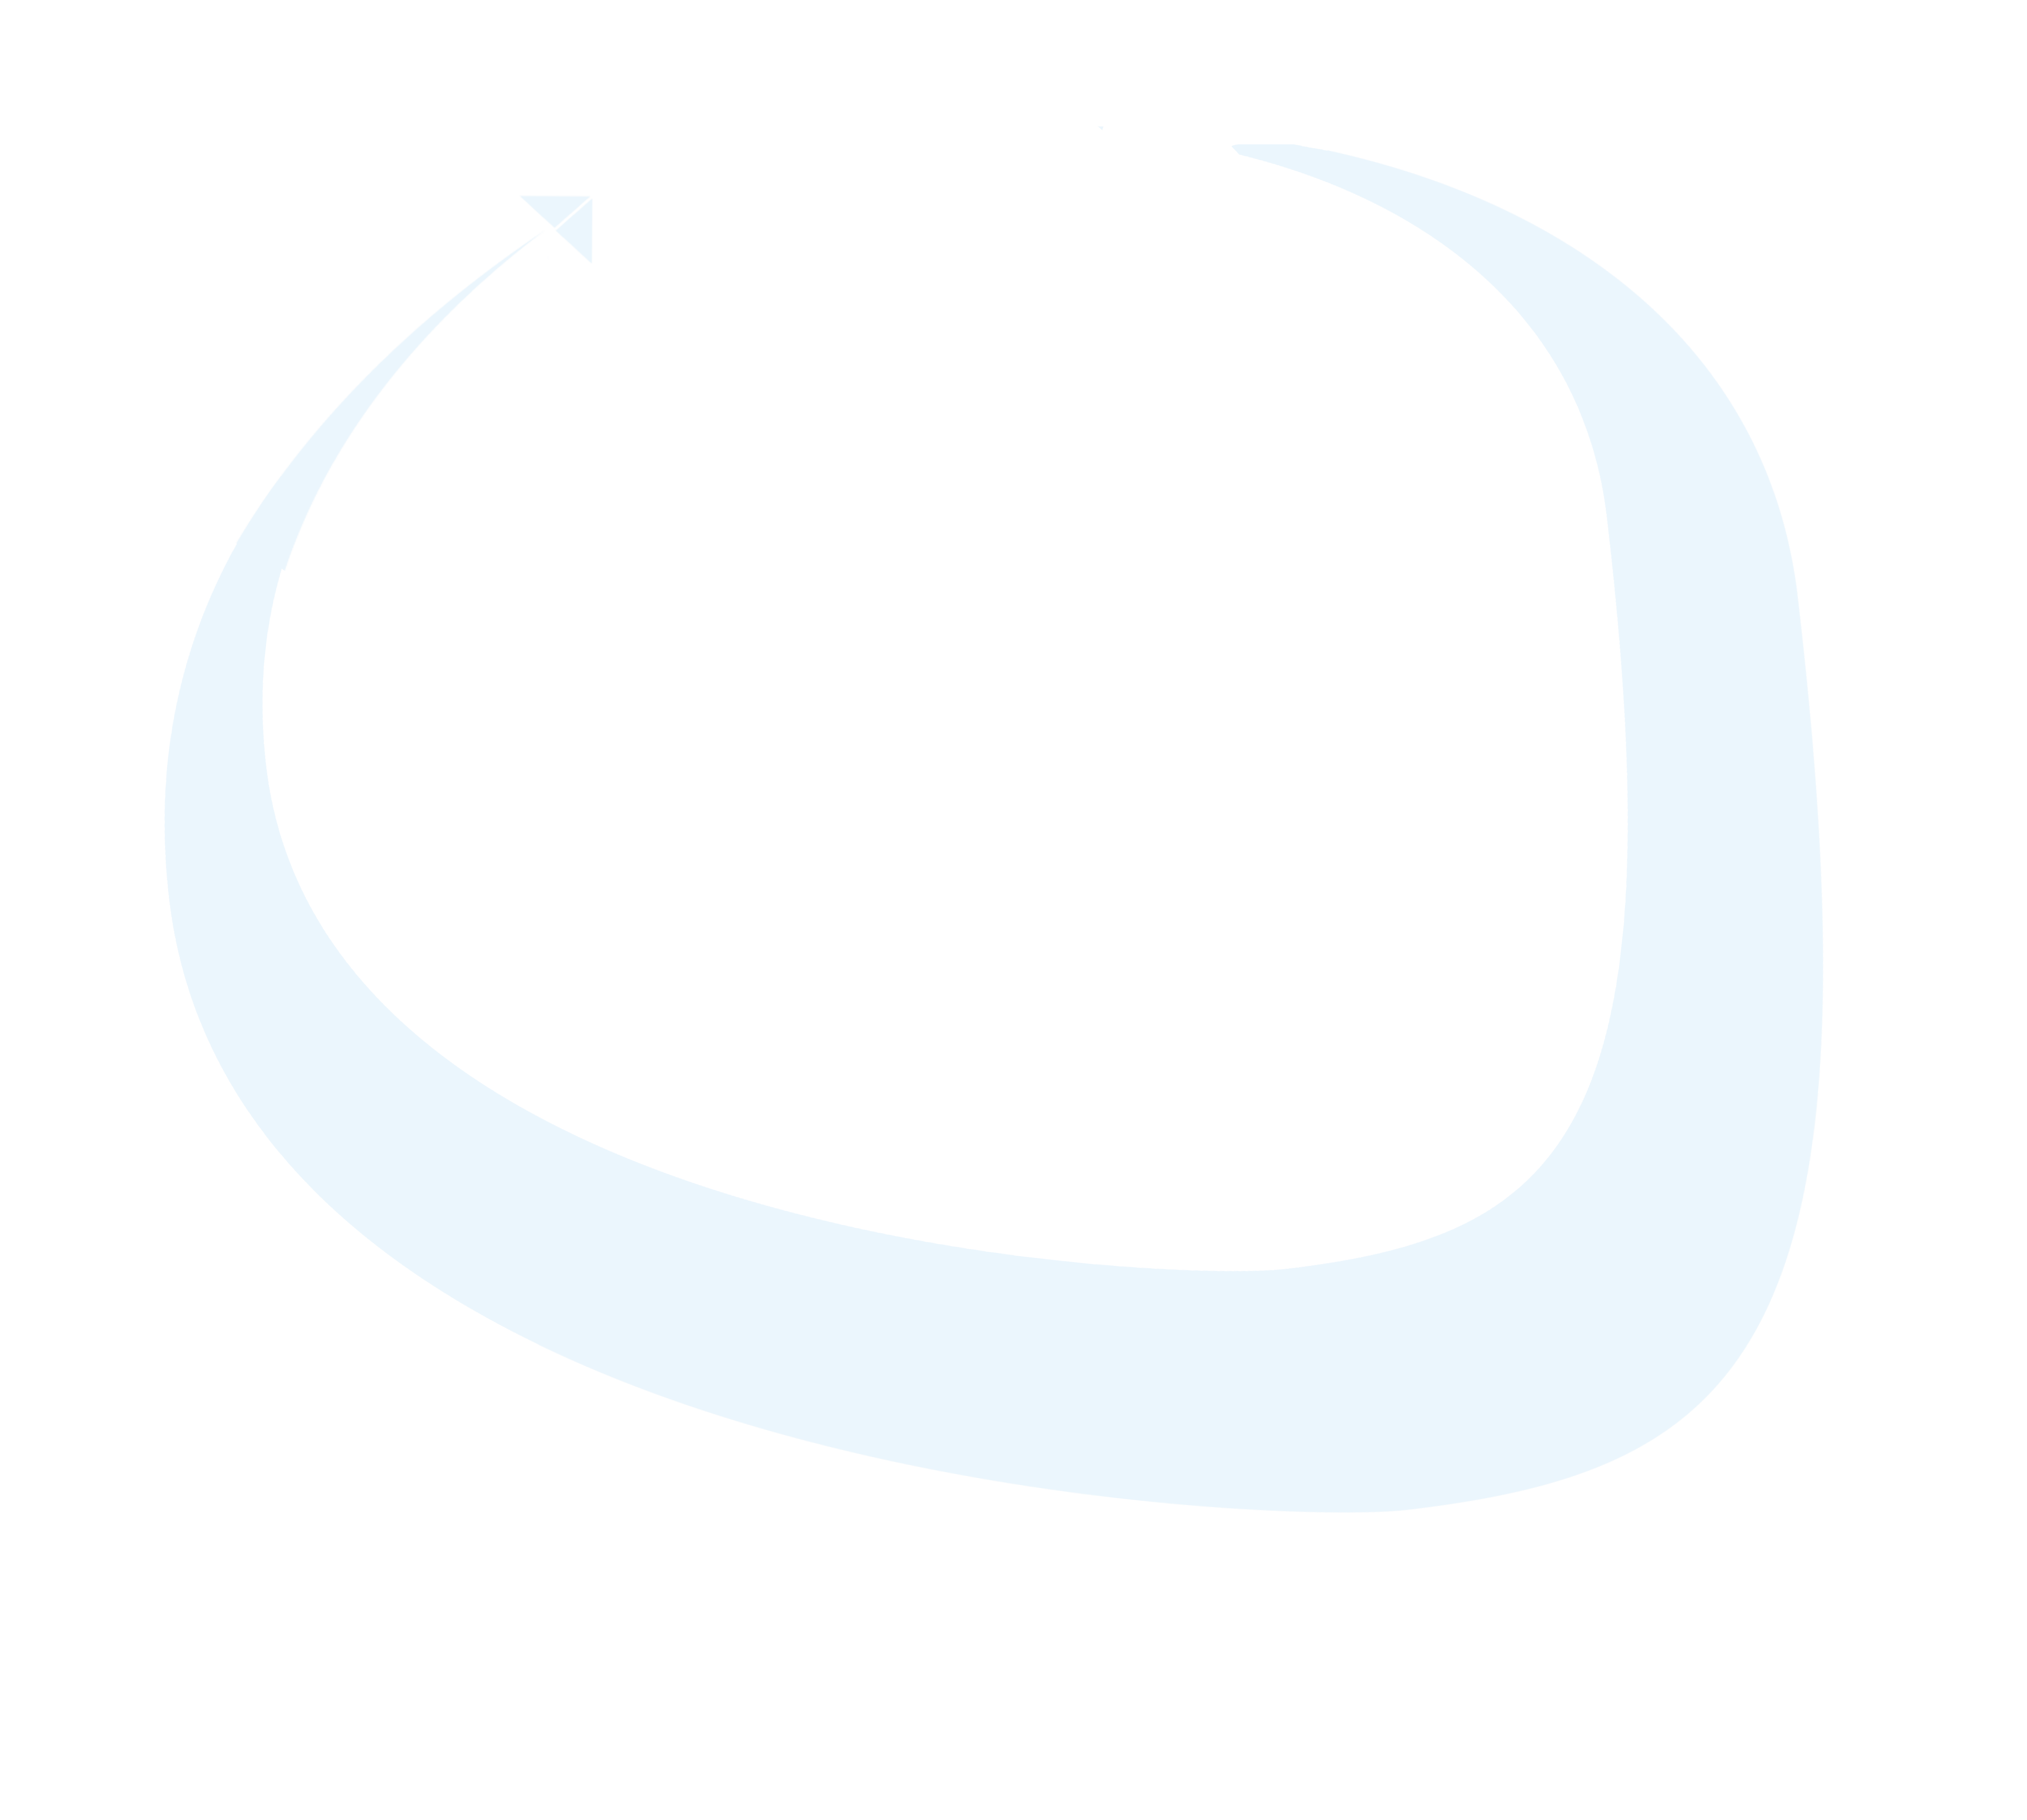 White rounded arrow